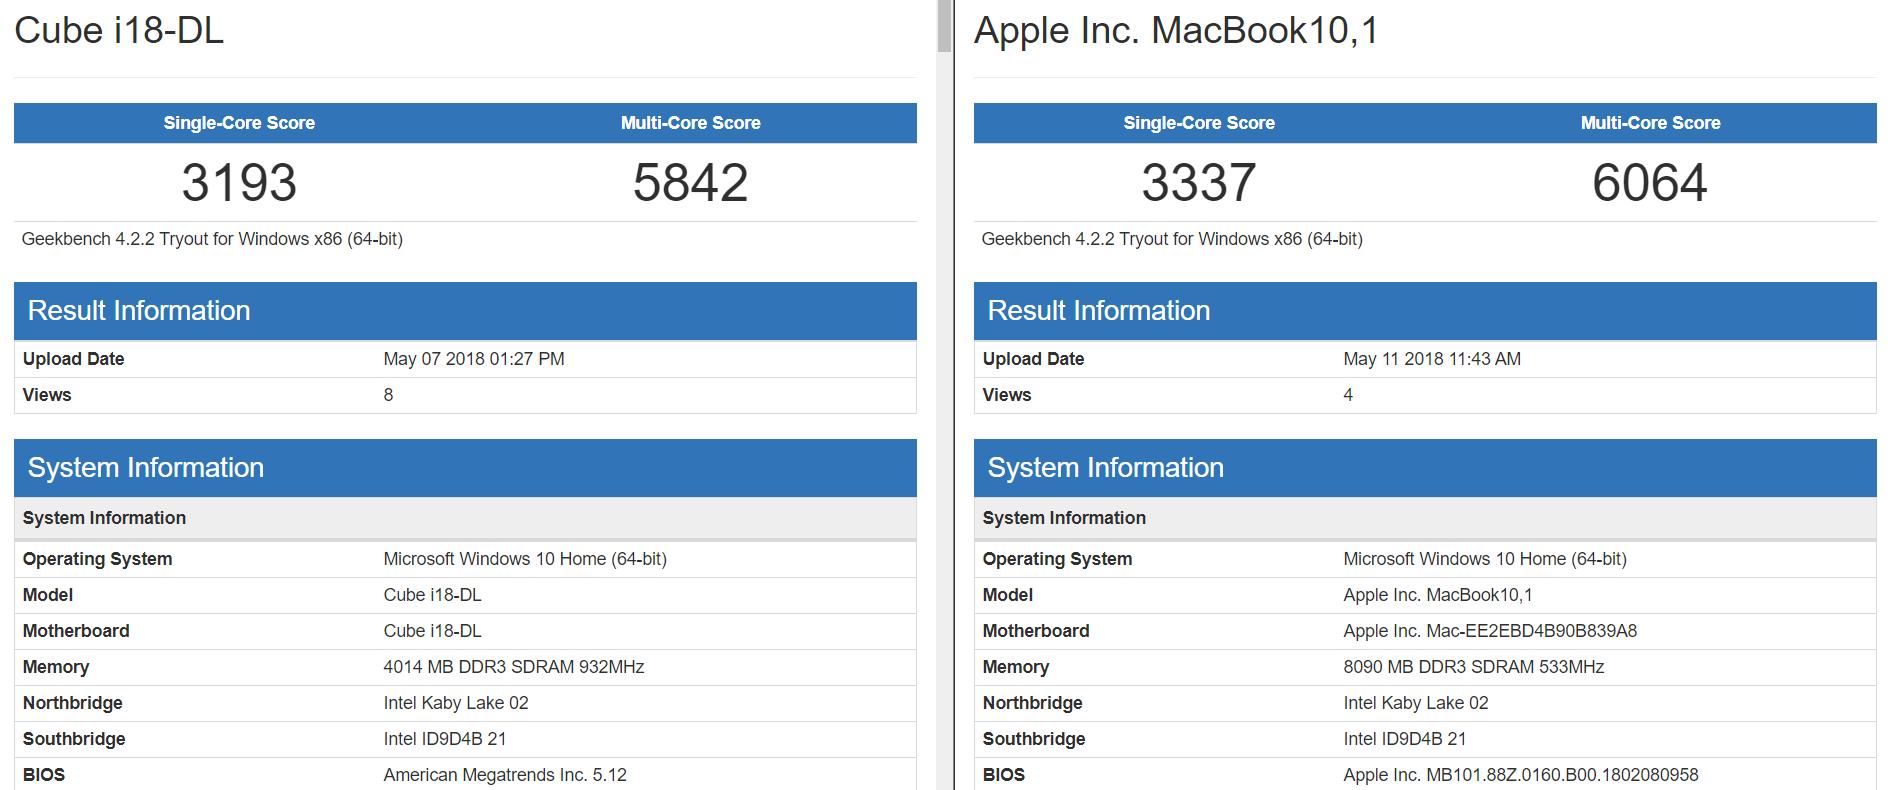 Geekbench macbook12 vs cube mix plus